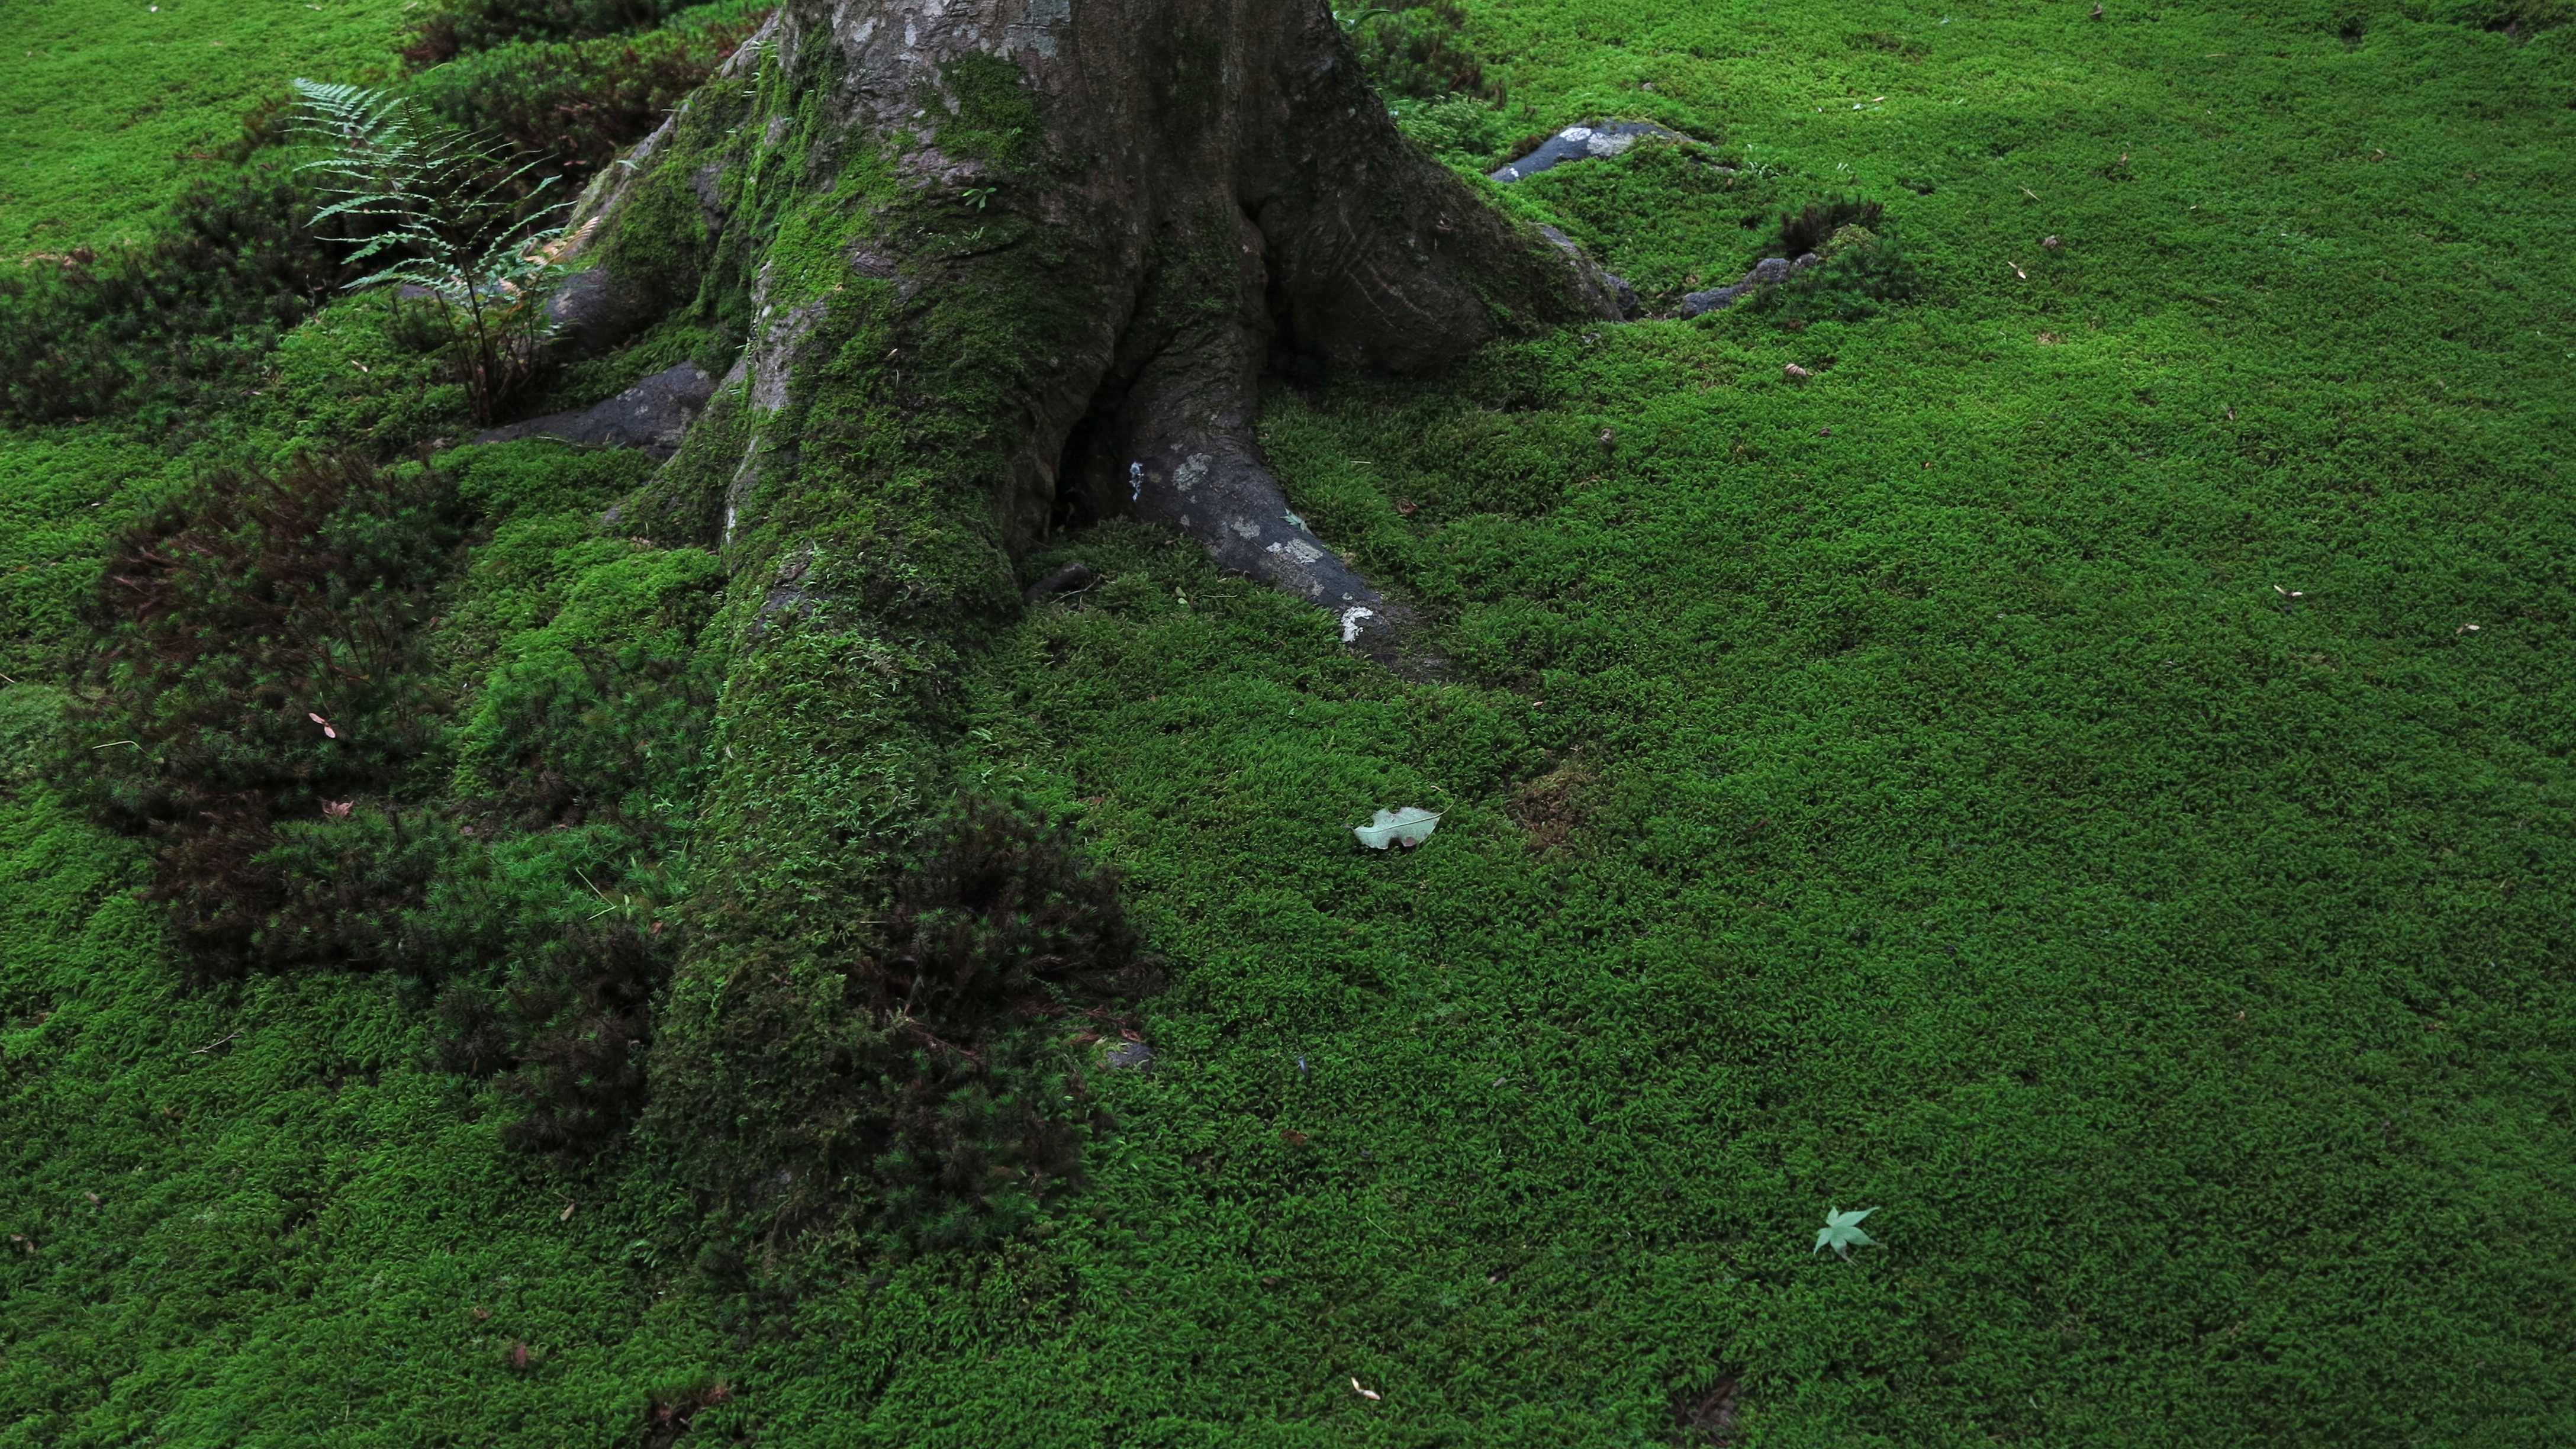 resolution dark moss green - photo #25